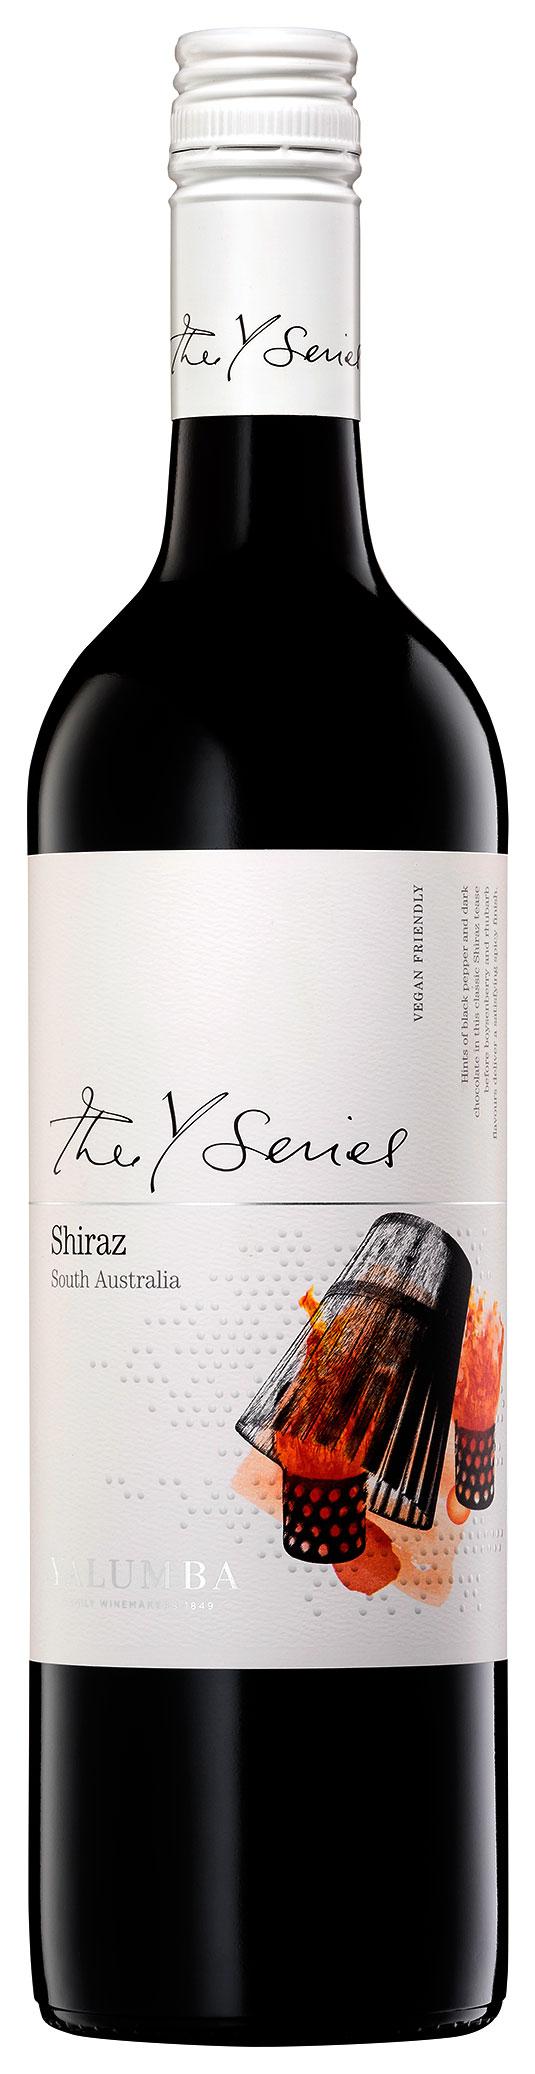 https://vinocorpperu.com/images/vinos/yalumba/y_series_shiraz_2018.jpg